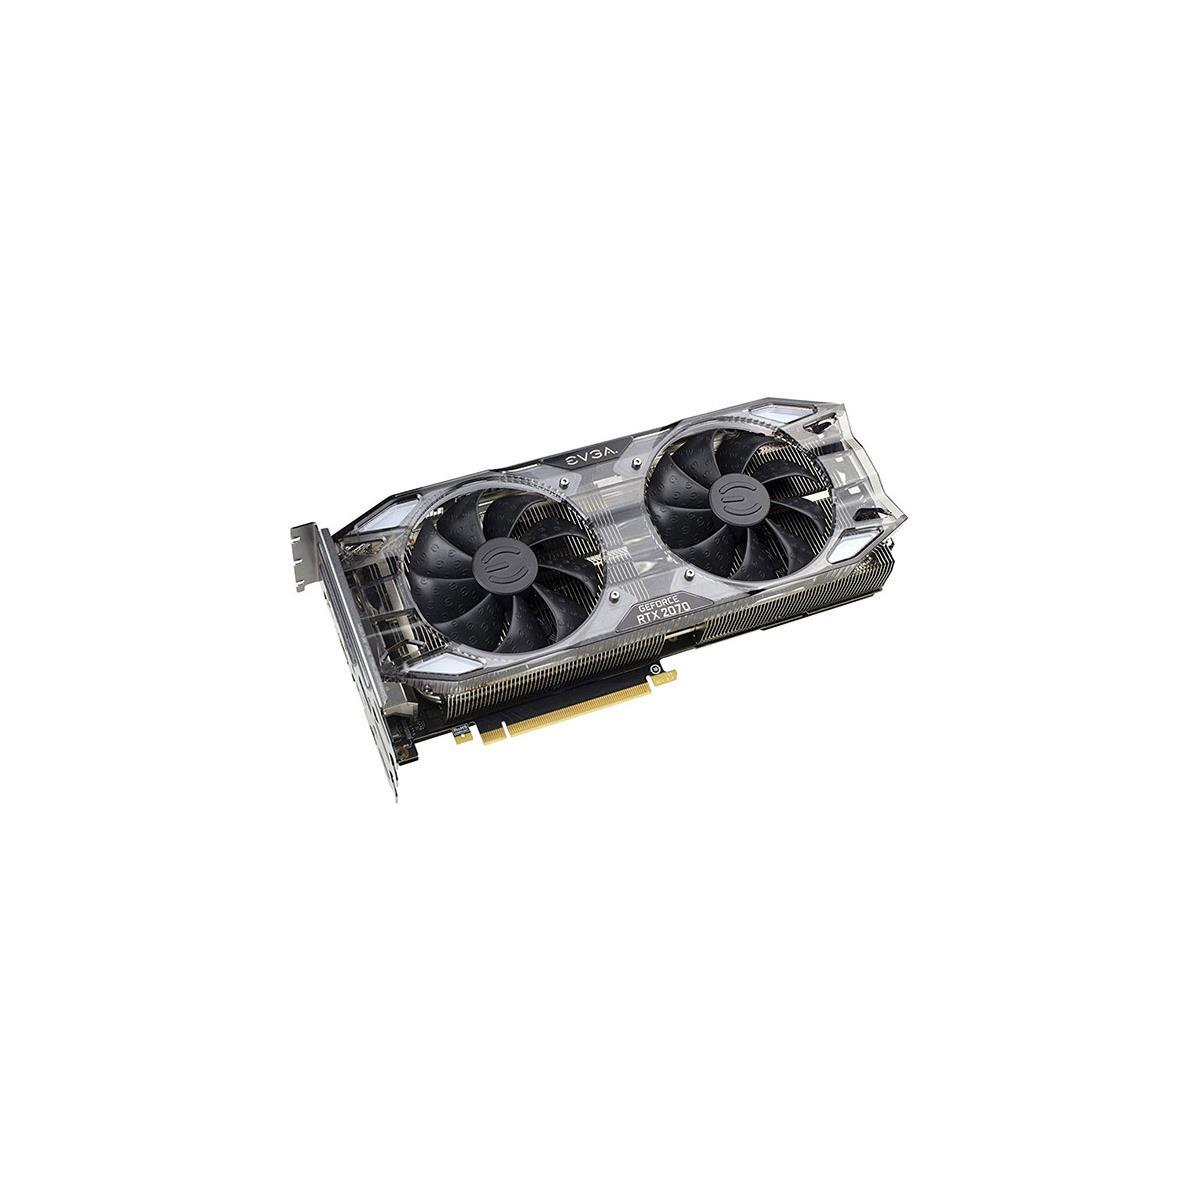 NVIDIA GeForce RTX 2070 Speed Binning Exposed: TU106-400A vs TU106